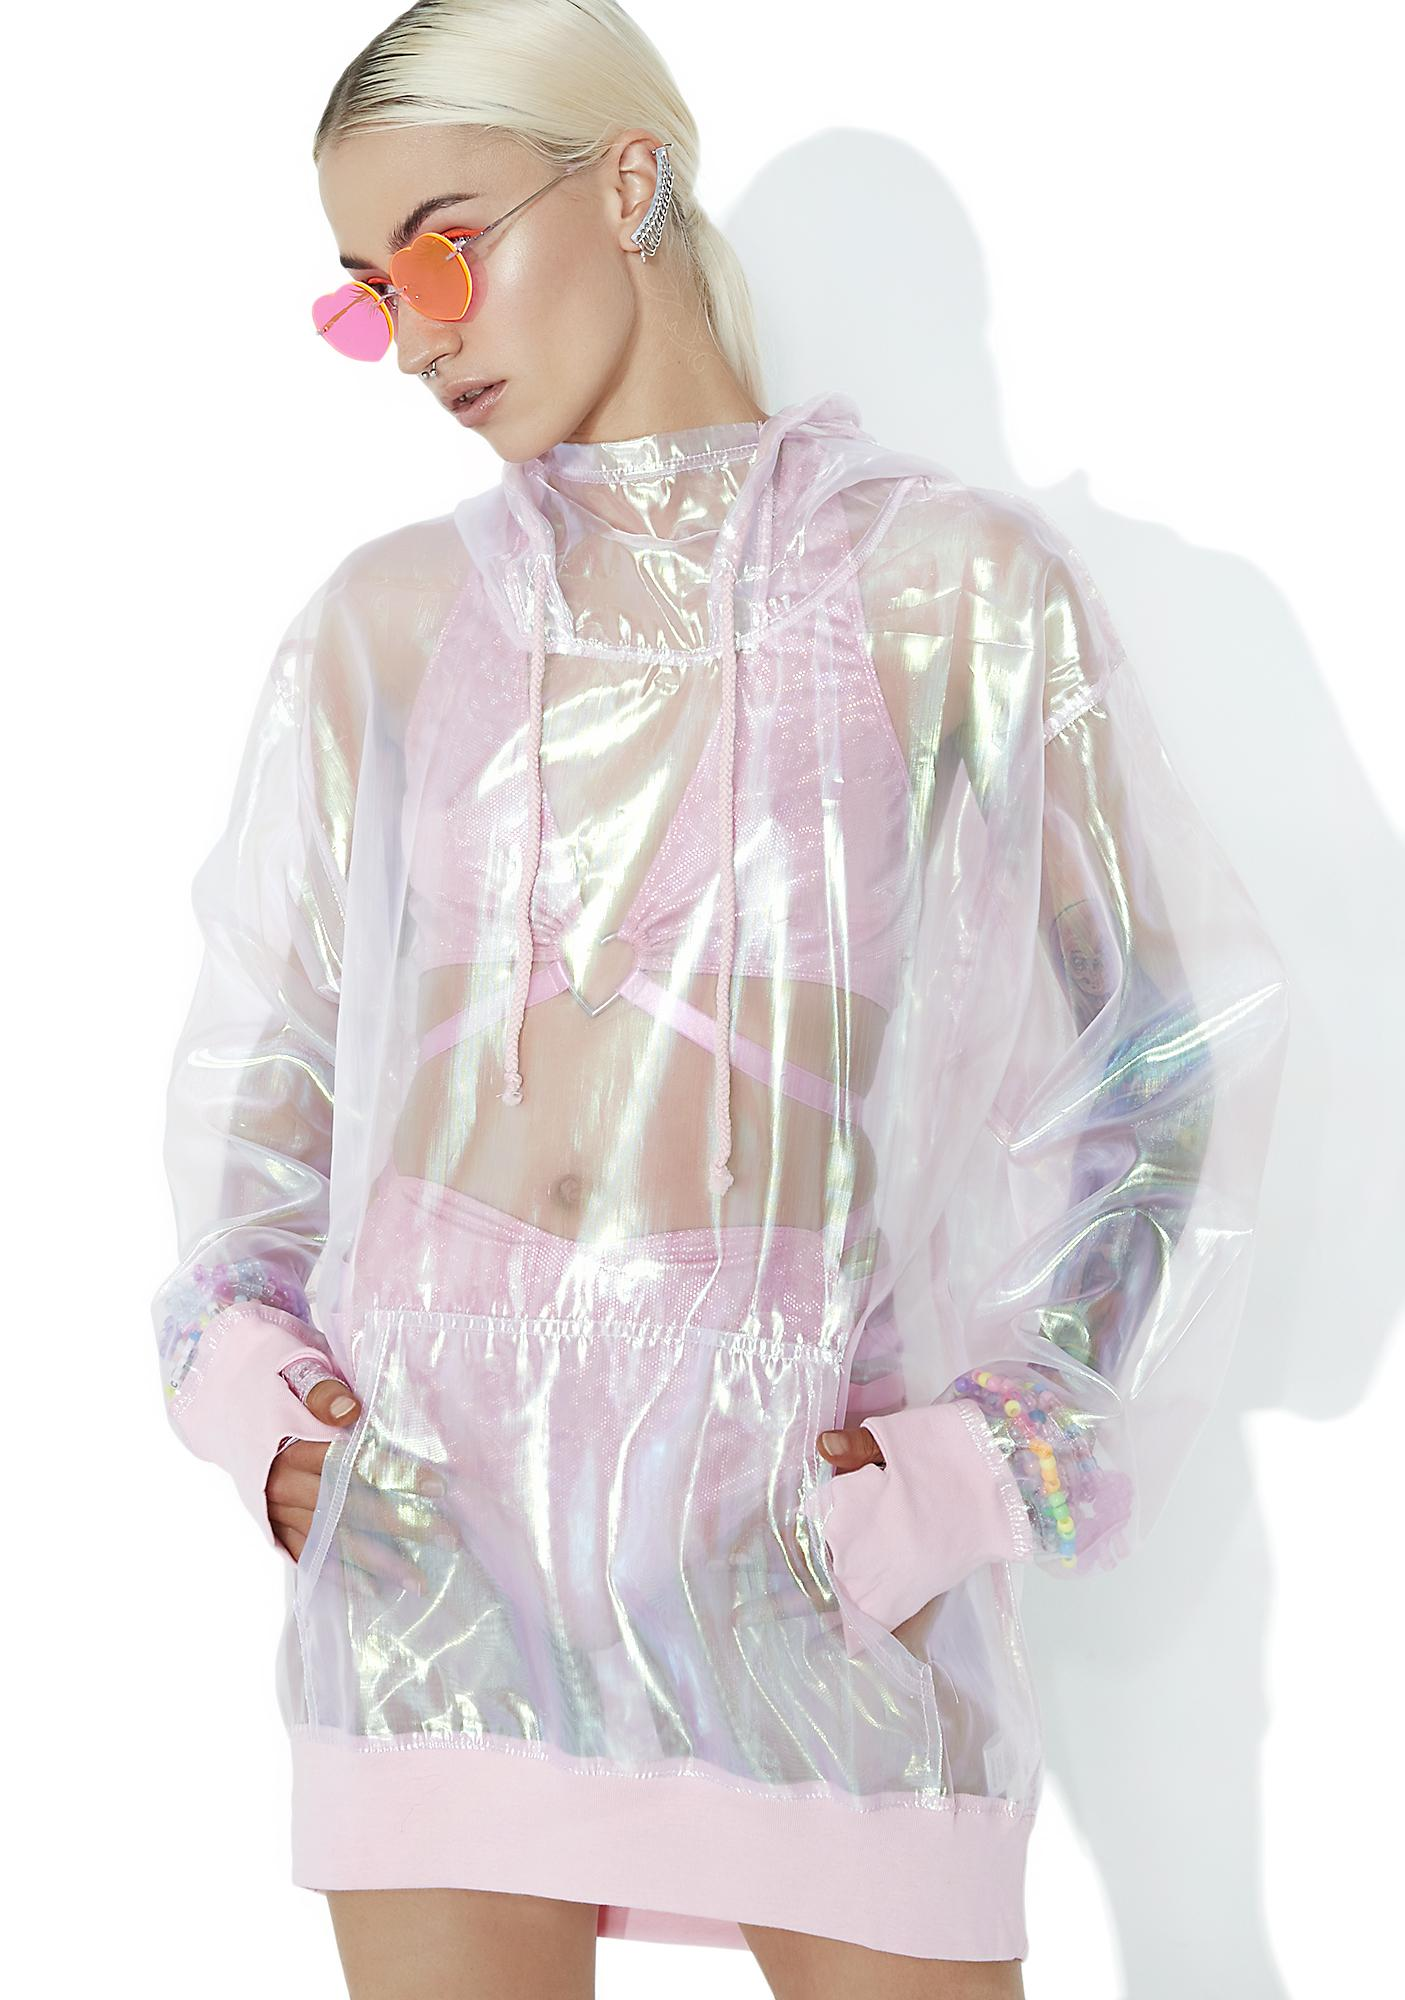 Club Exx Bubble Pop Iridescent Hoodie